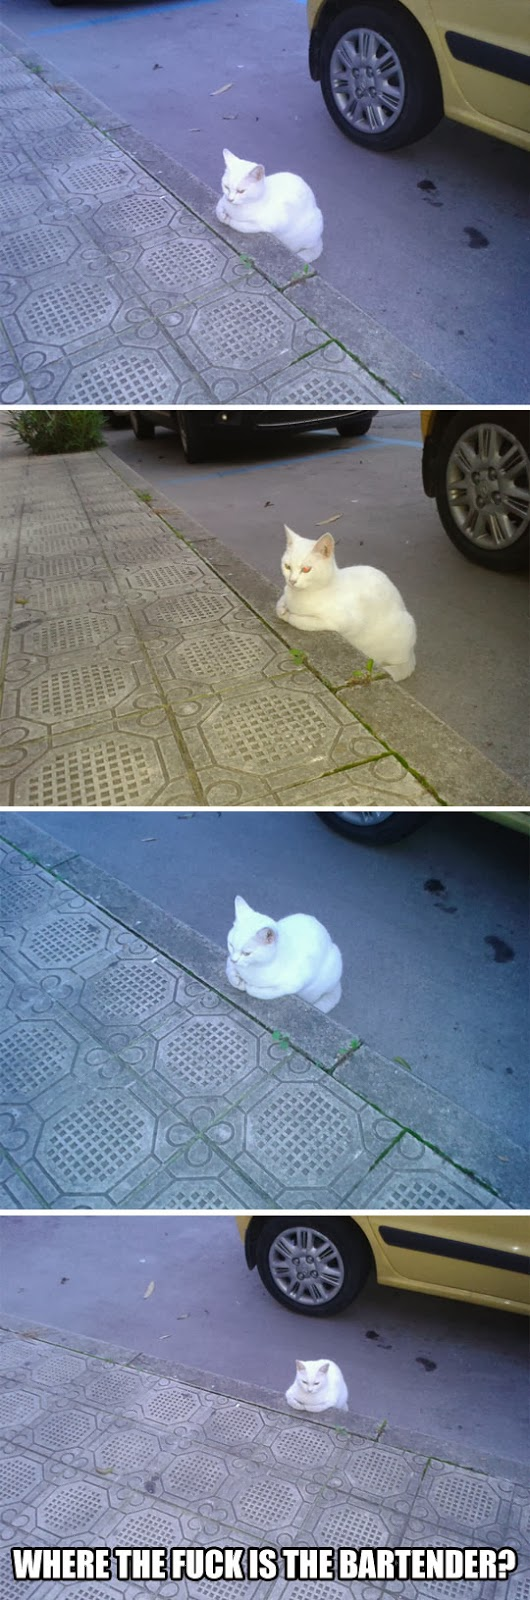 funny-cat-white-waiting-bar